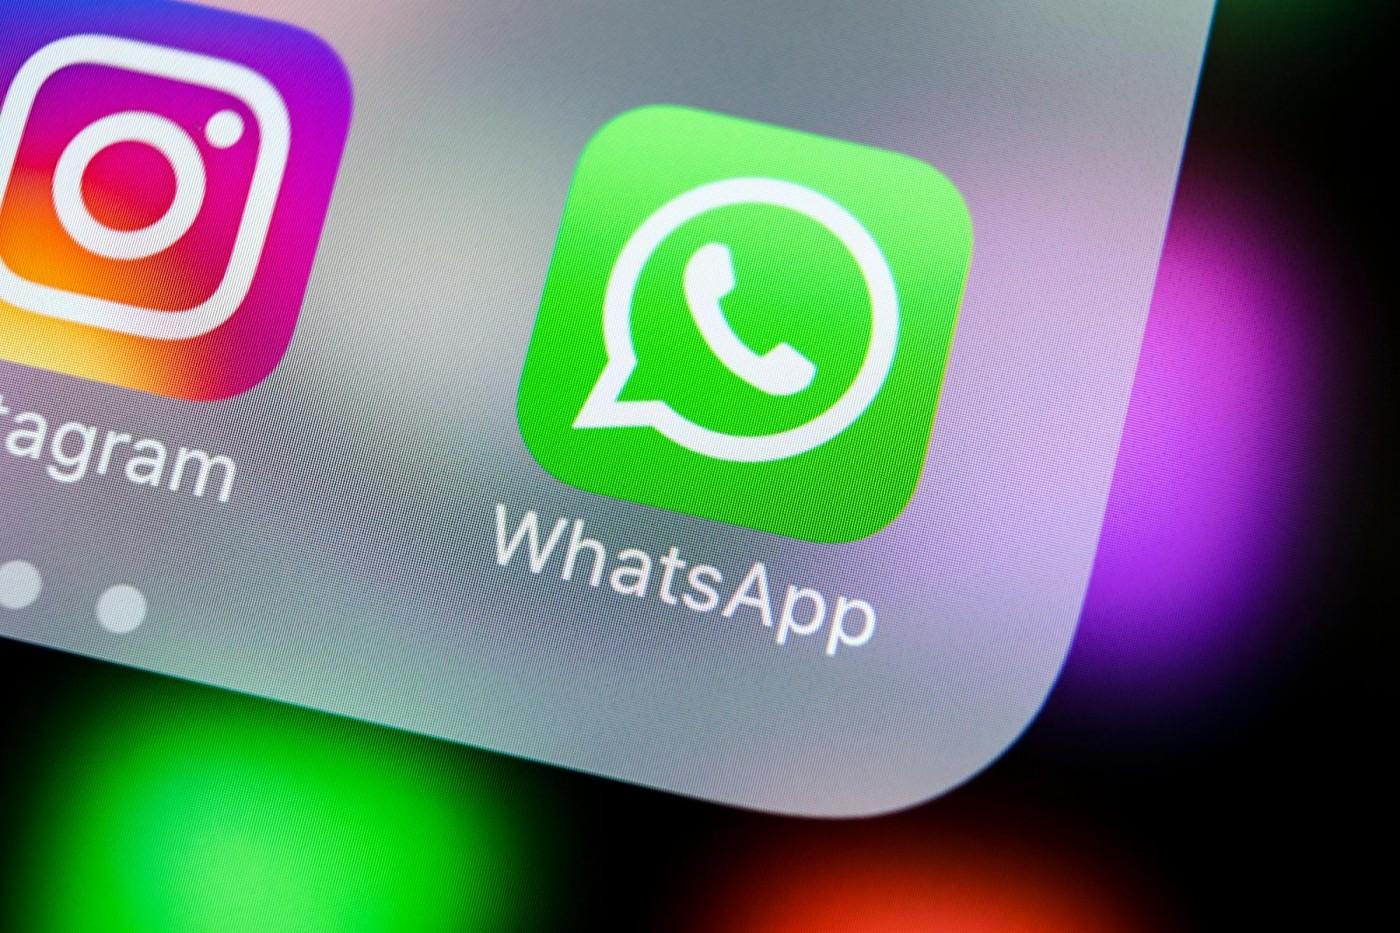 WhatsApp打擊假新聞新招:每則訊息最多只能轉發5次